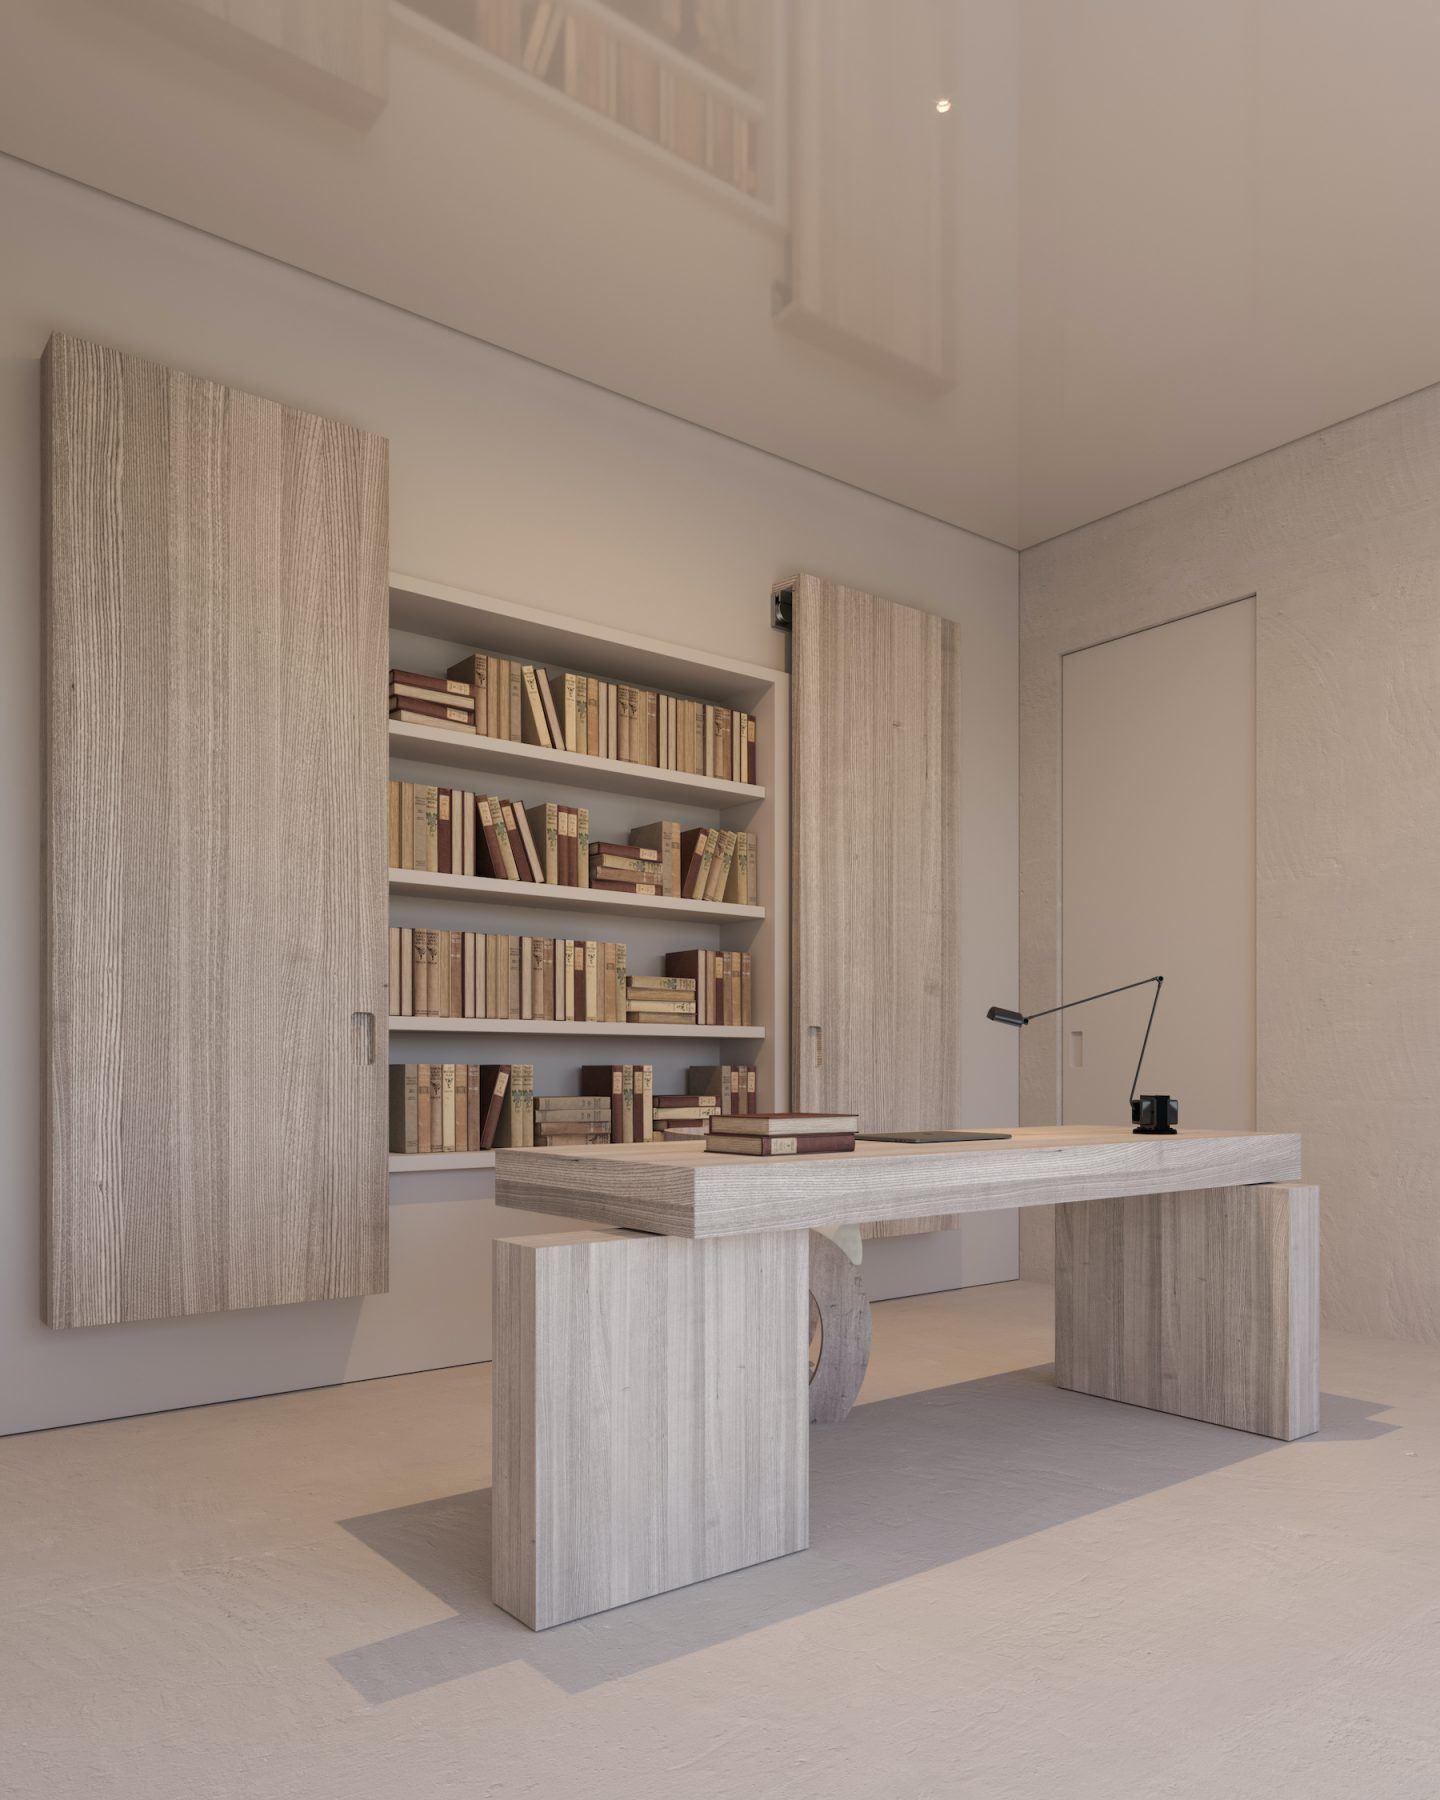 IGNANT-Design-Kanstantsin-Remez-II-Introvert-Residence-014